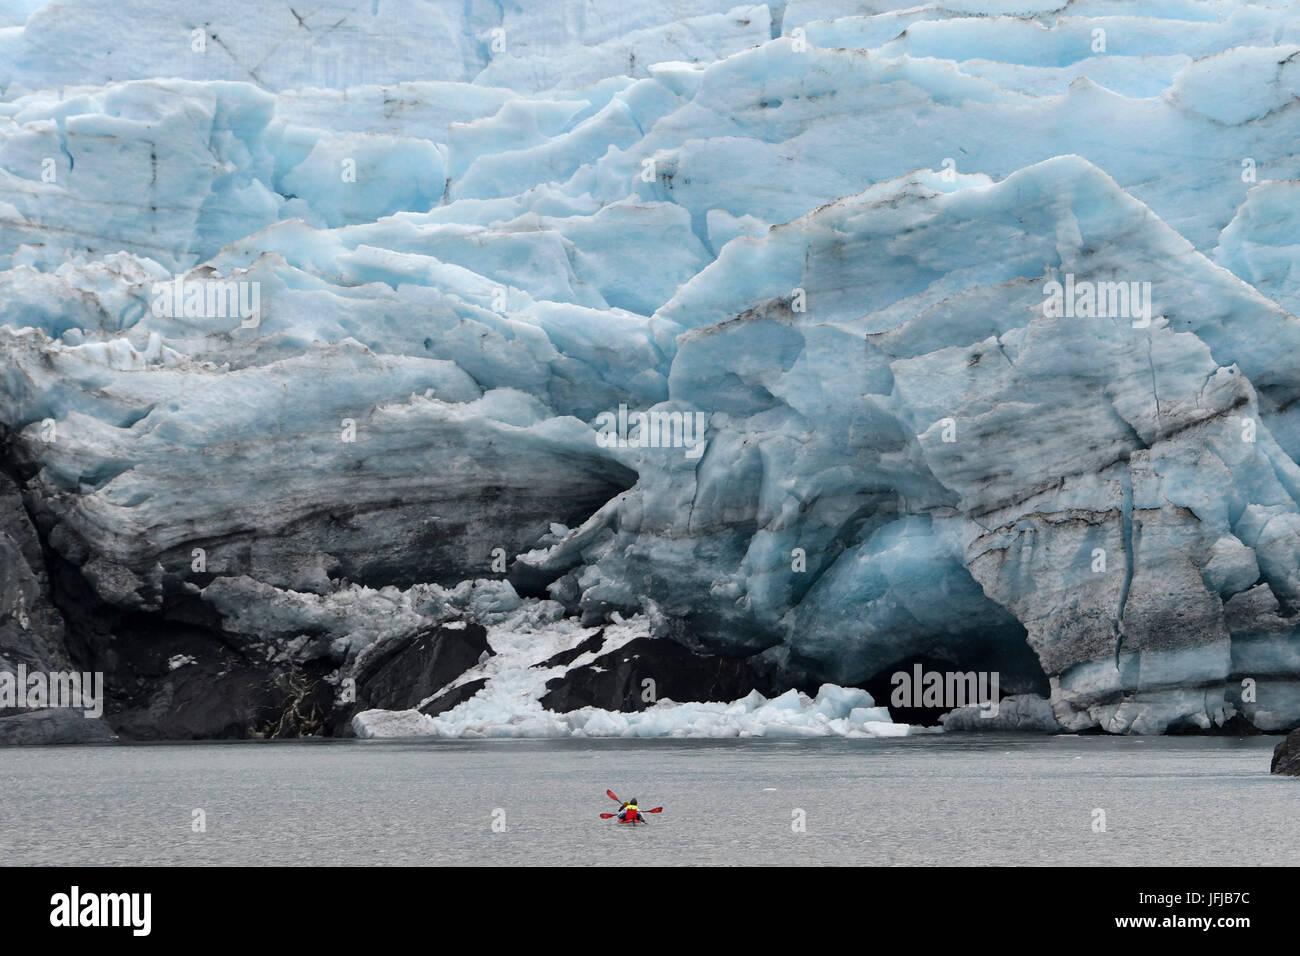 Red canoe (kayak) close to glacier front, Portage glacier, Alaska, USA - Stock Image